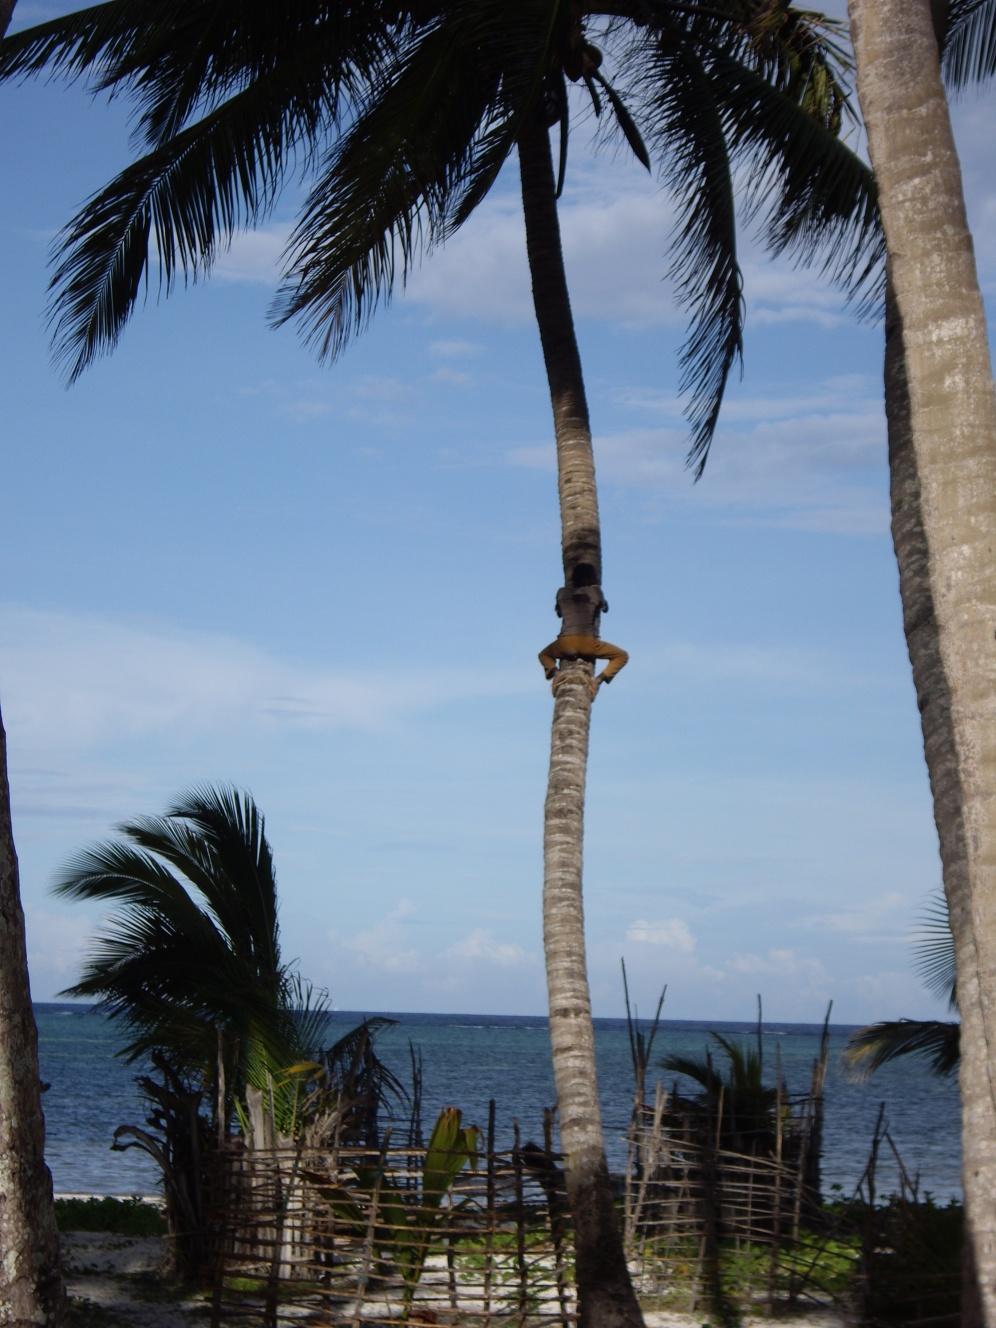 palm tree zanzibar beach glacier boma africa safari tanzania kilimanjaro wildlife